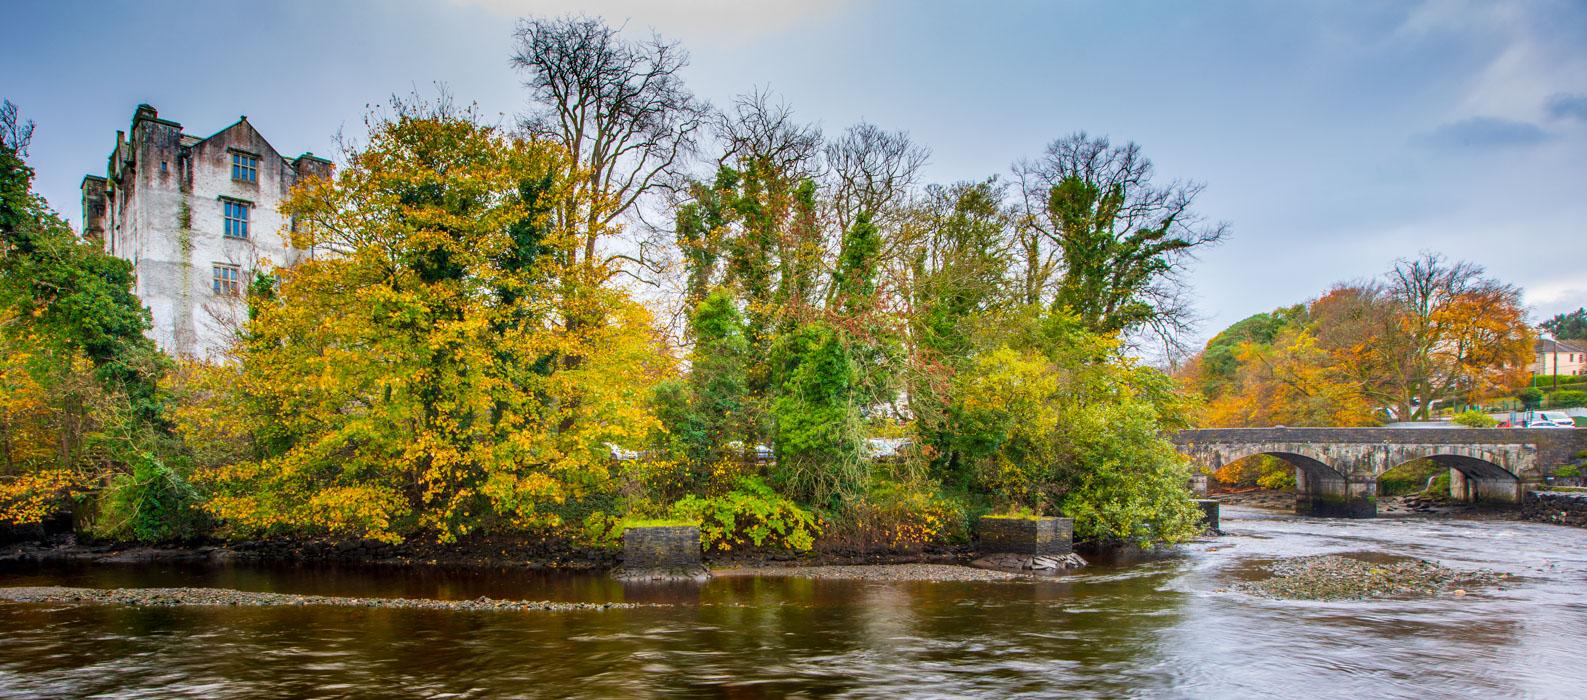 Donegal Castle river and bridge, Ireland